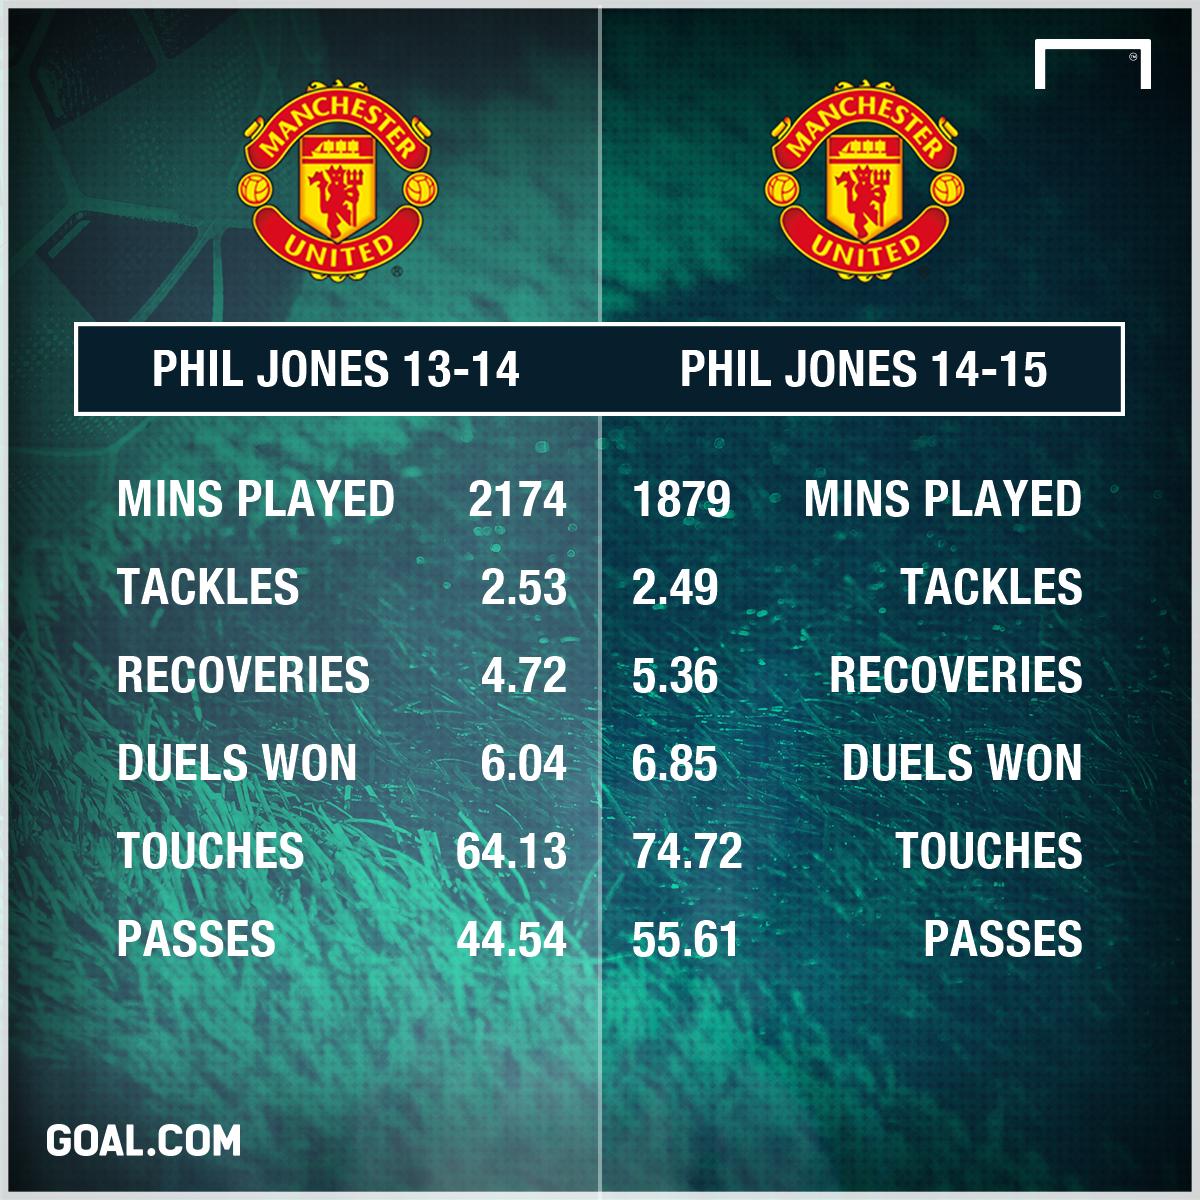 Phil Jones Manchester United 13-15